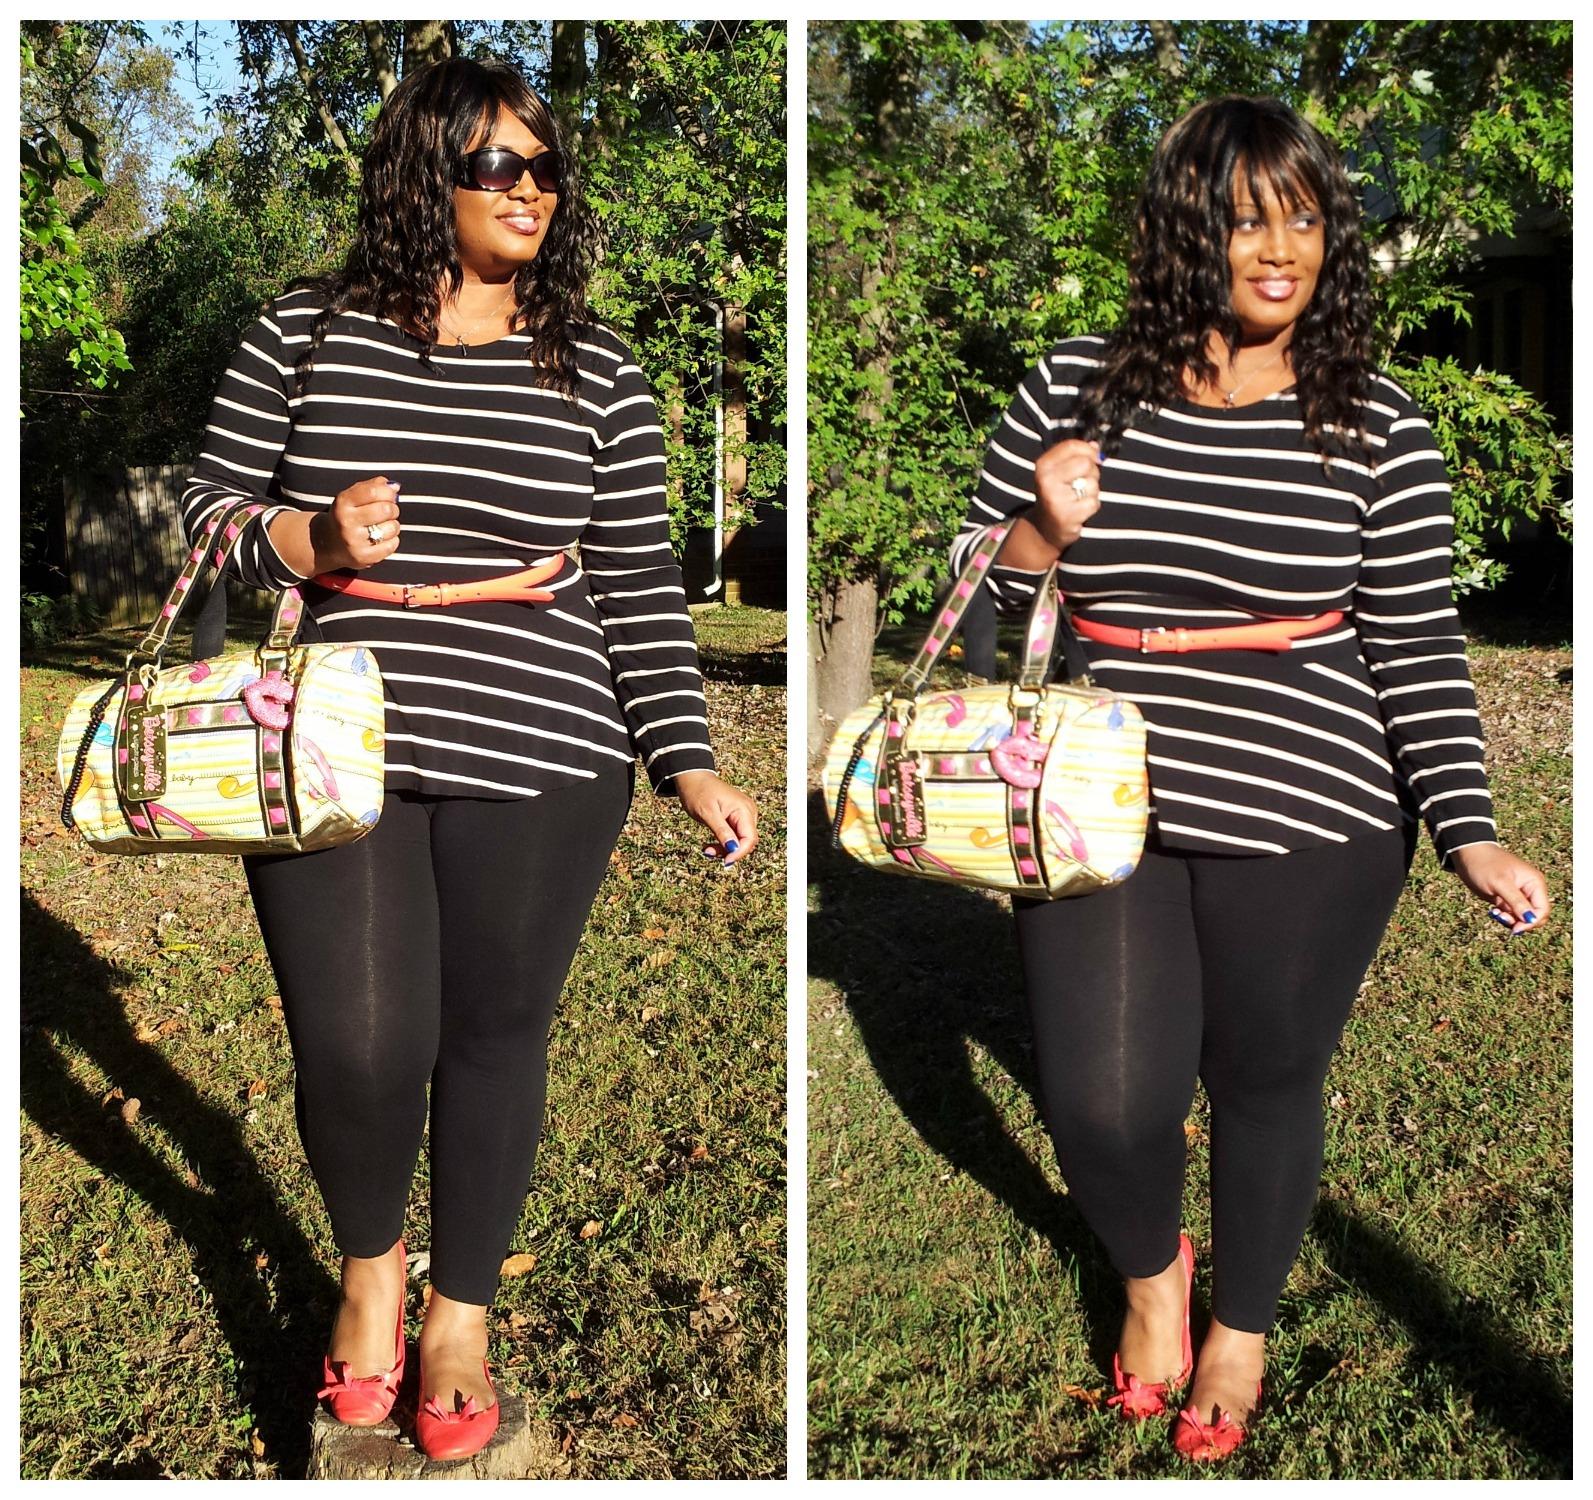 OOTD Week #2- Fashion Friday in Just My Size Leggings | u0026quot;Trendy Curvesu0026quot; by Bella Styles LLC